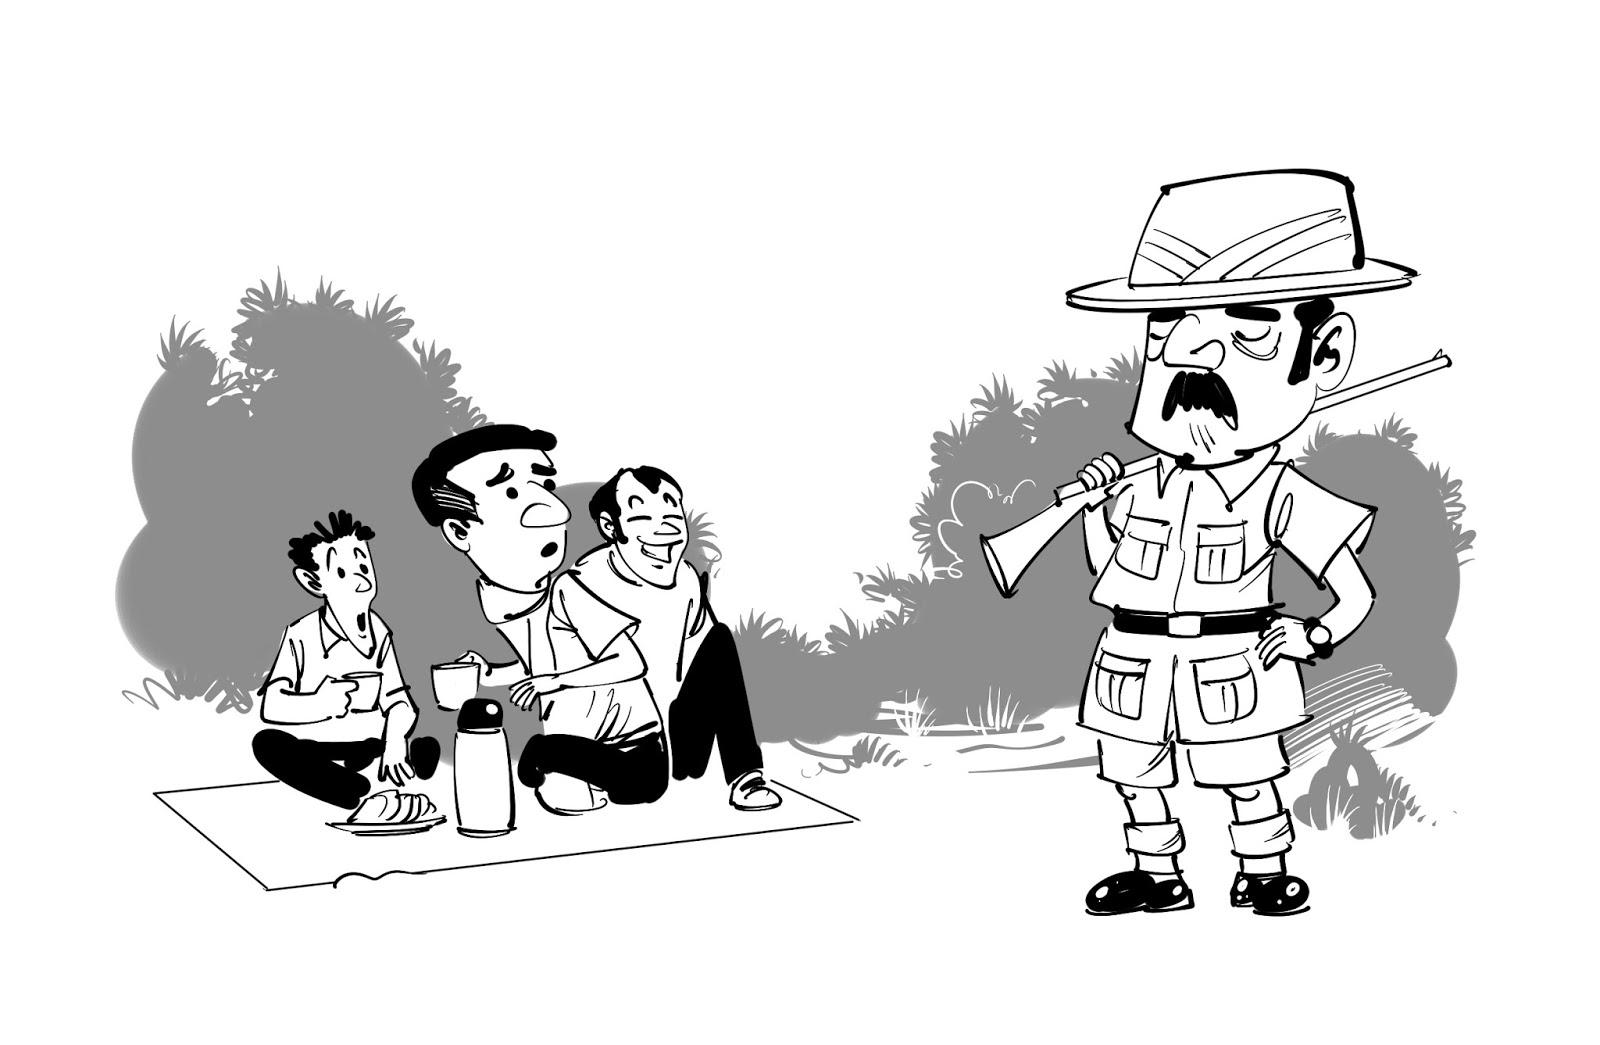 kids book illustration funny proud hunter in uniform and gun